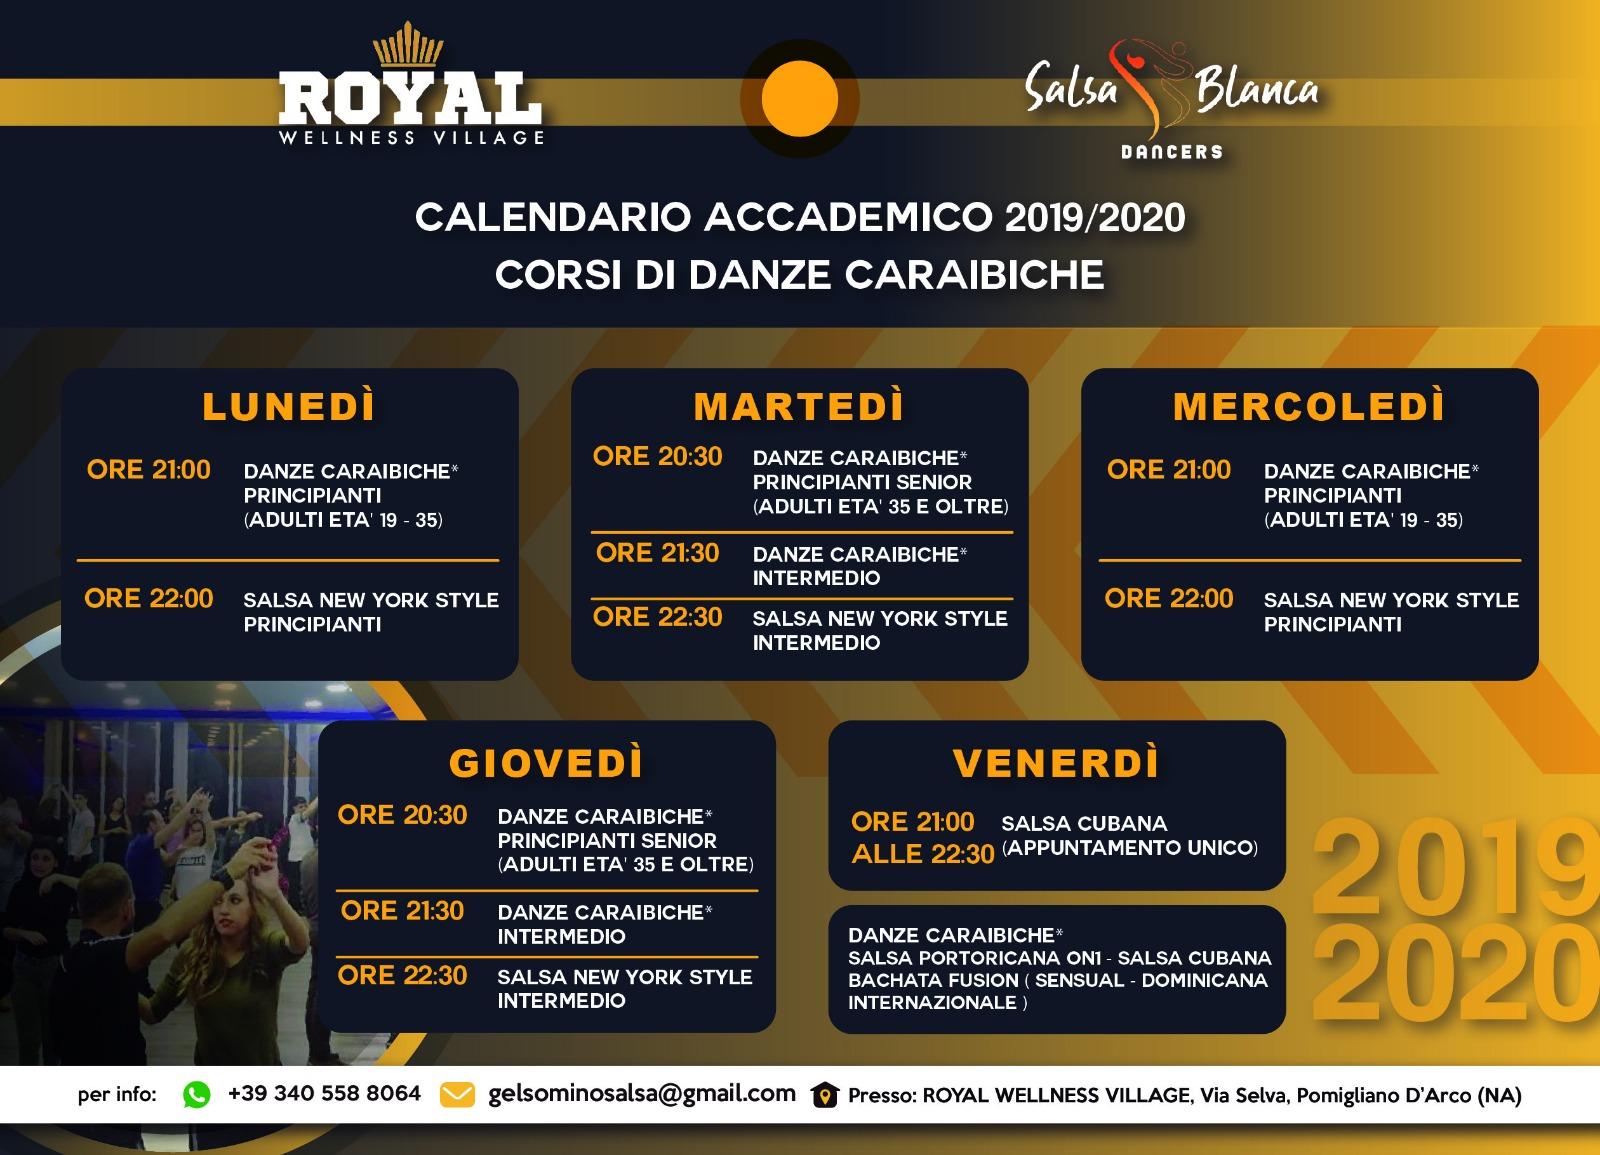 Calendario Accademico 2020.Anno Accademico 2019 2020 International Salsa Blanca